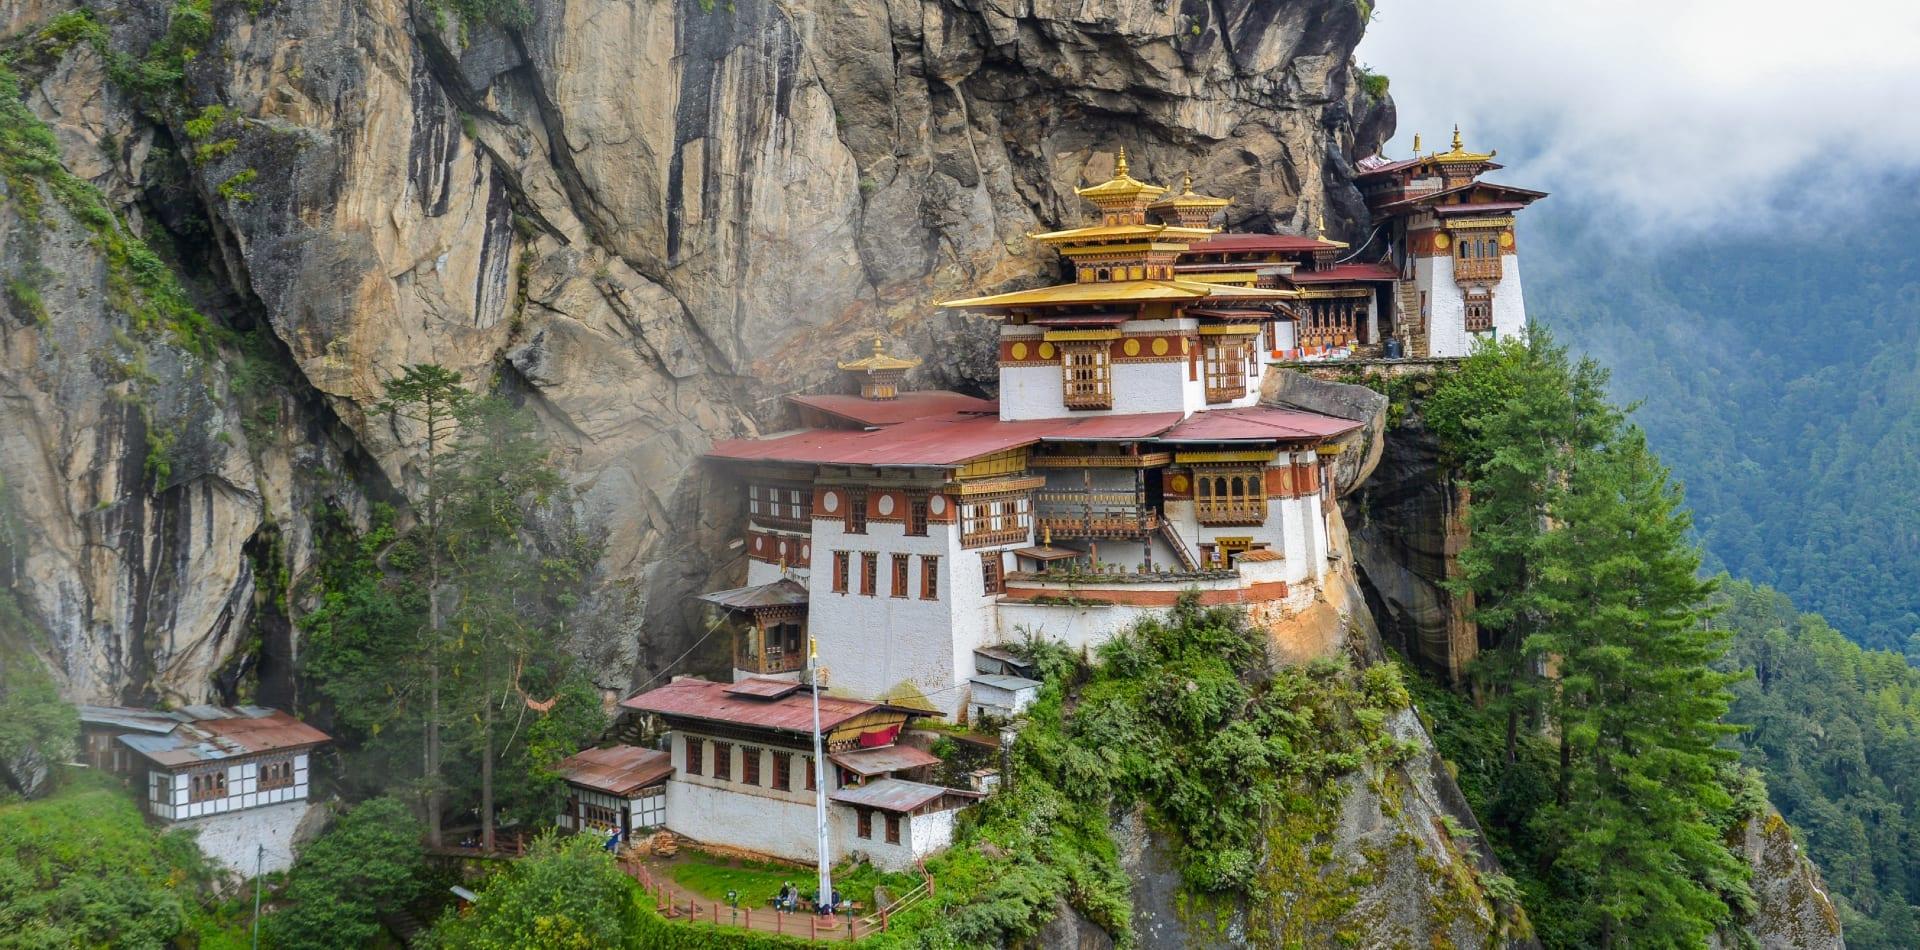 Tigers Nest Temple in Bhutan